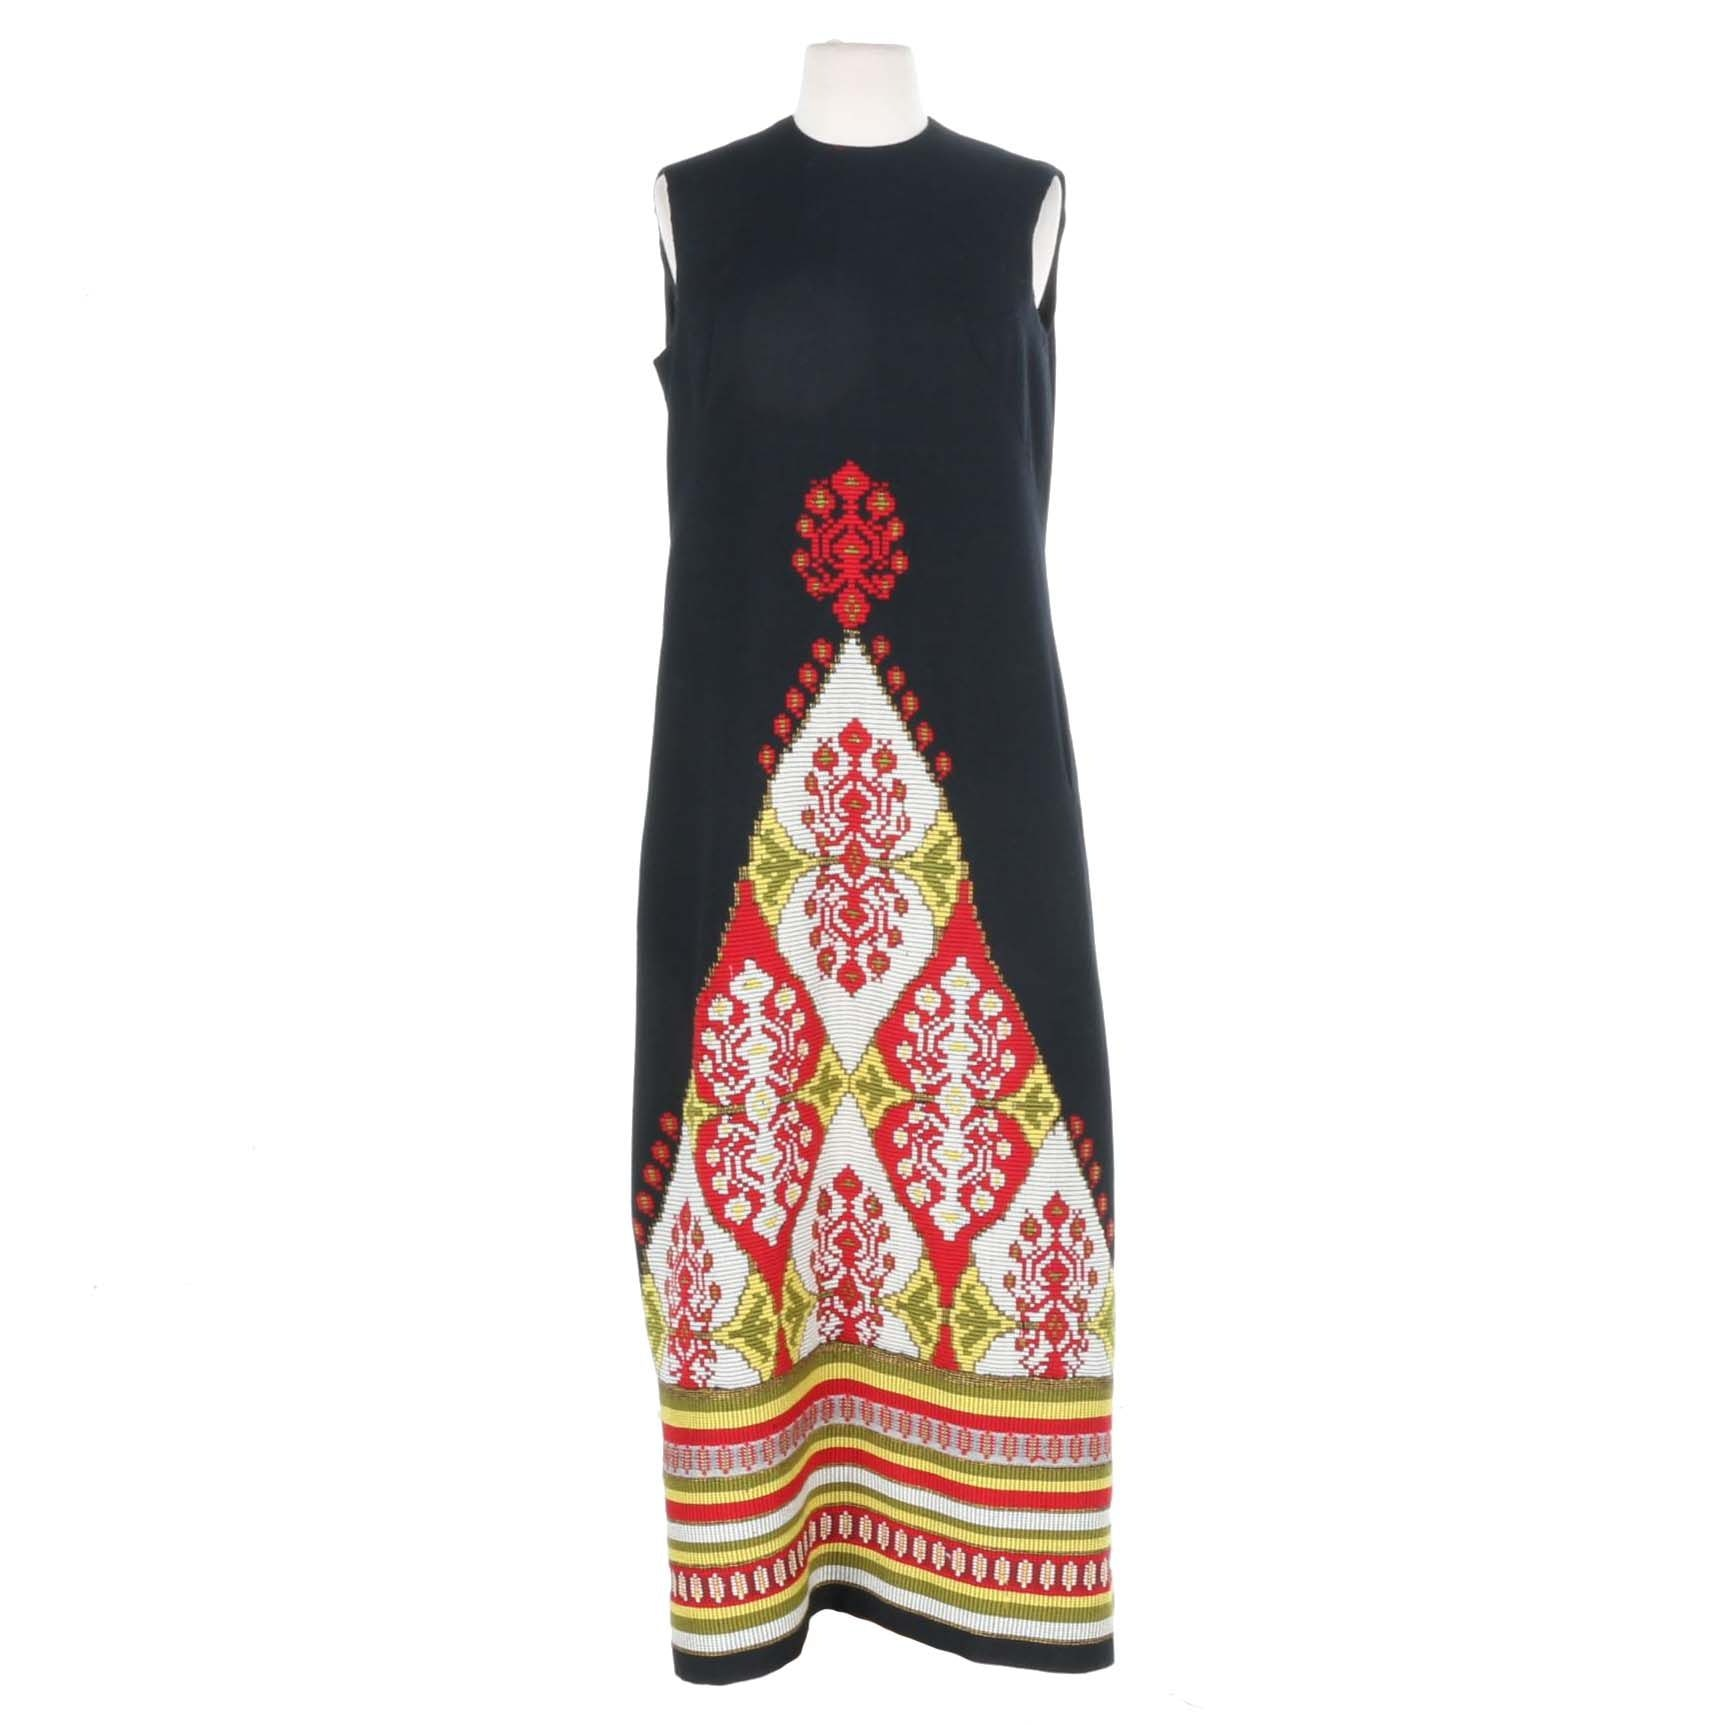 Vintage Levantis Embroidered Maxi Dress